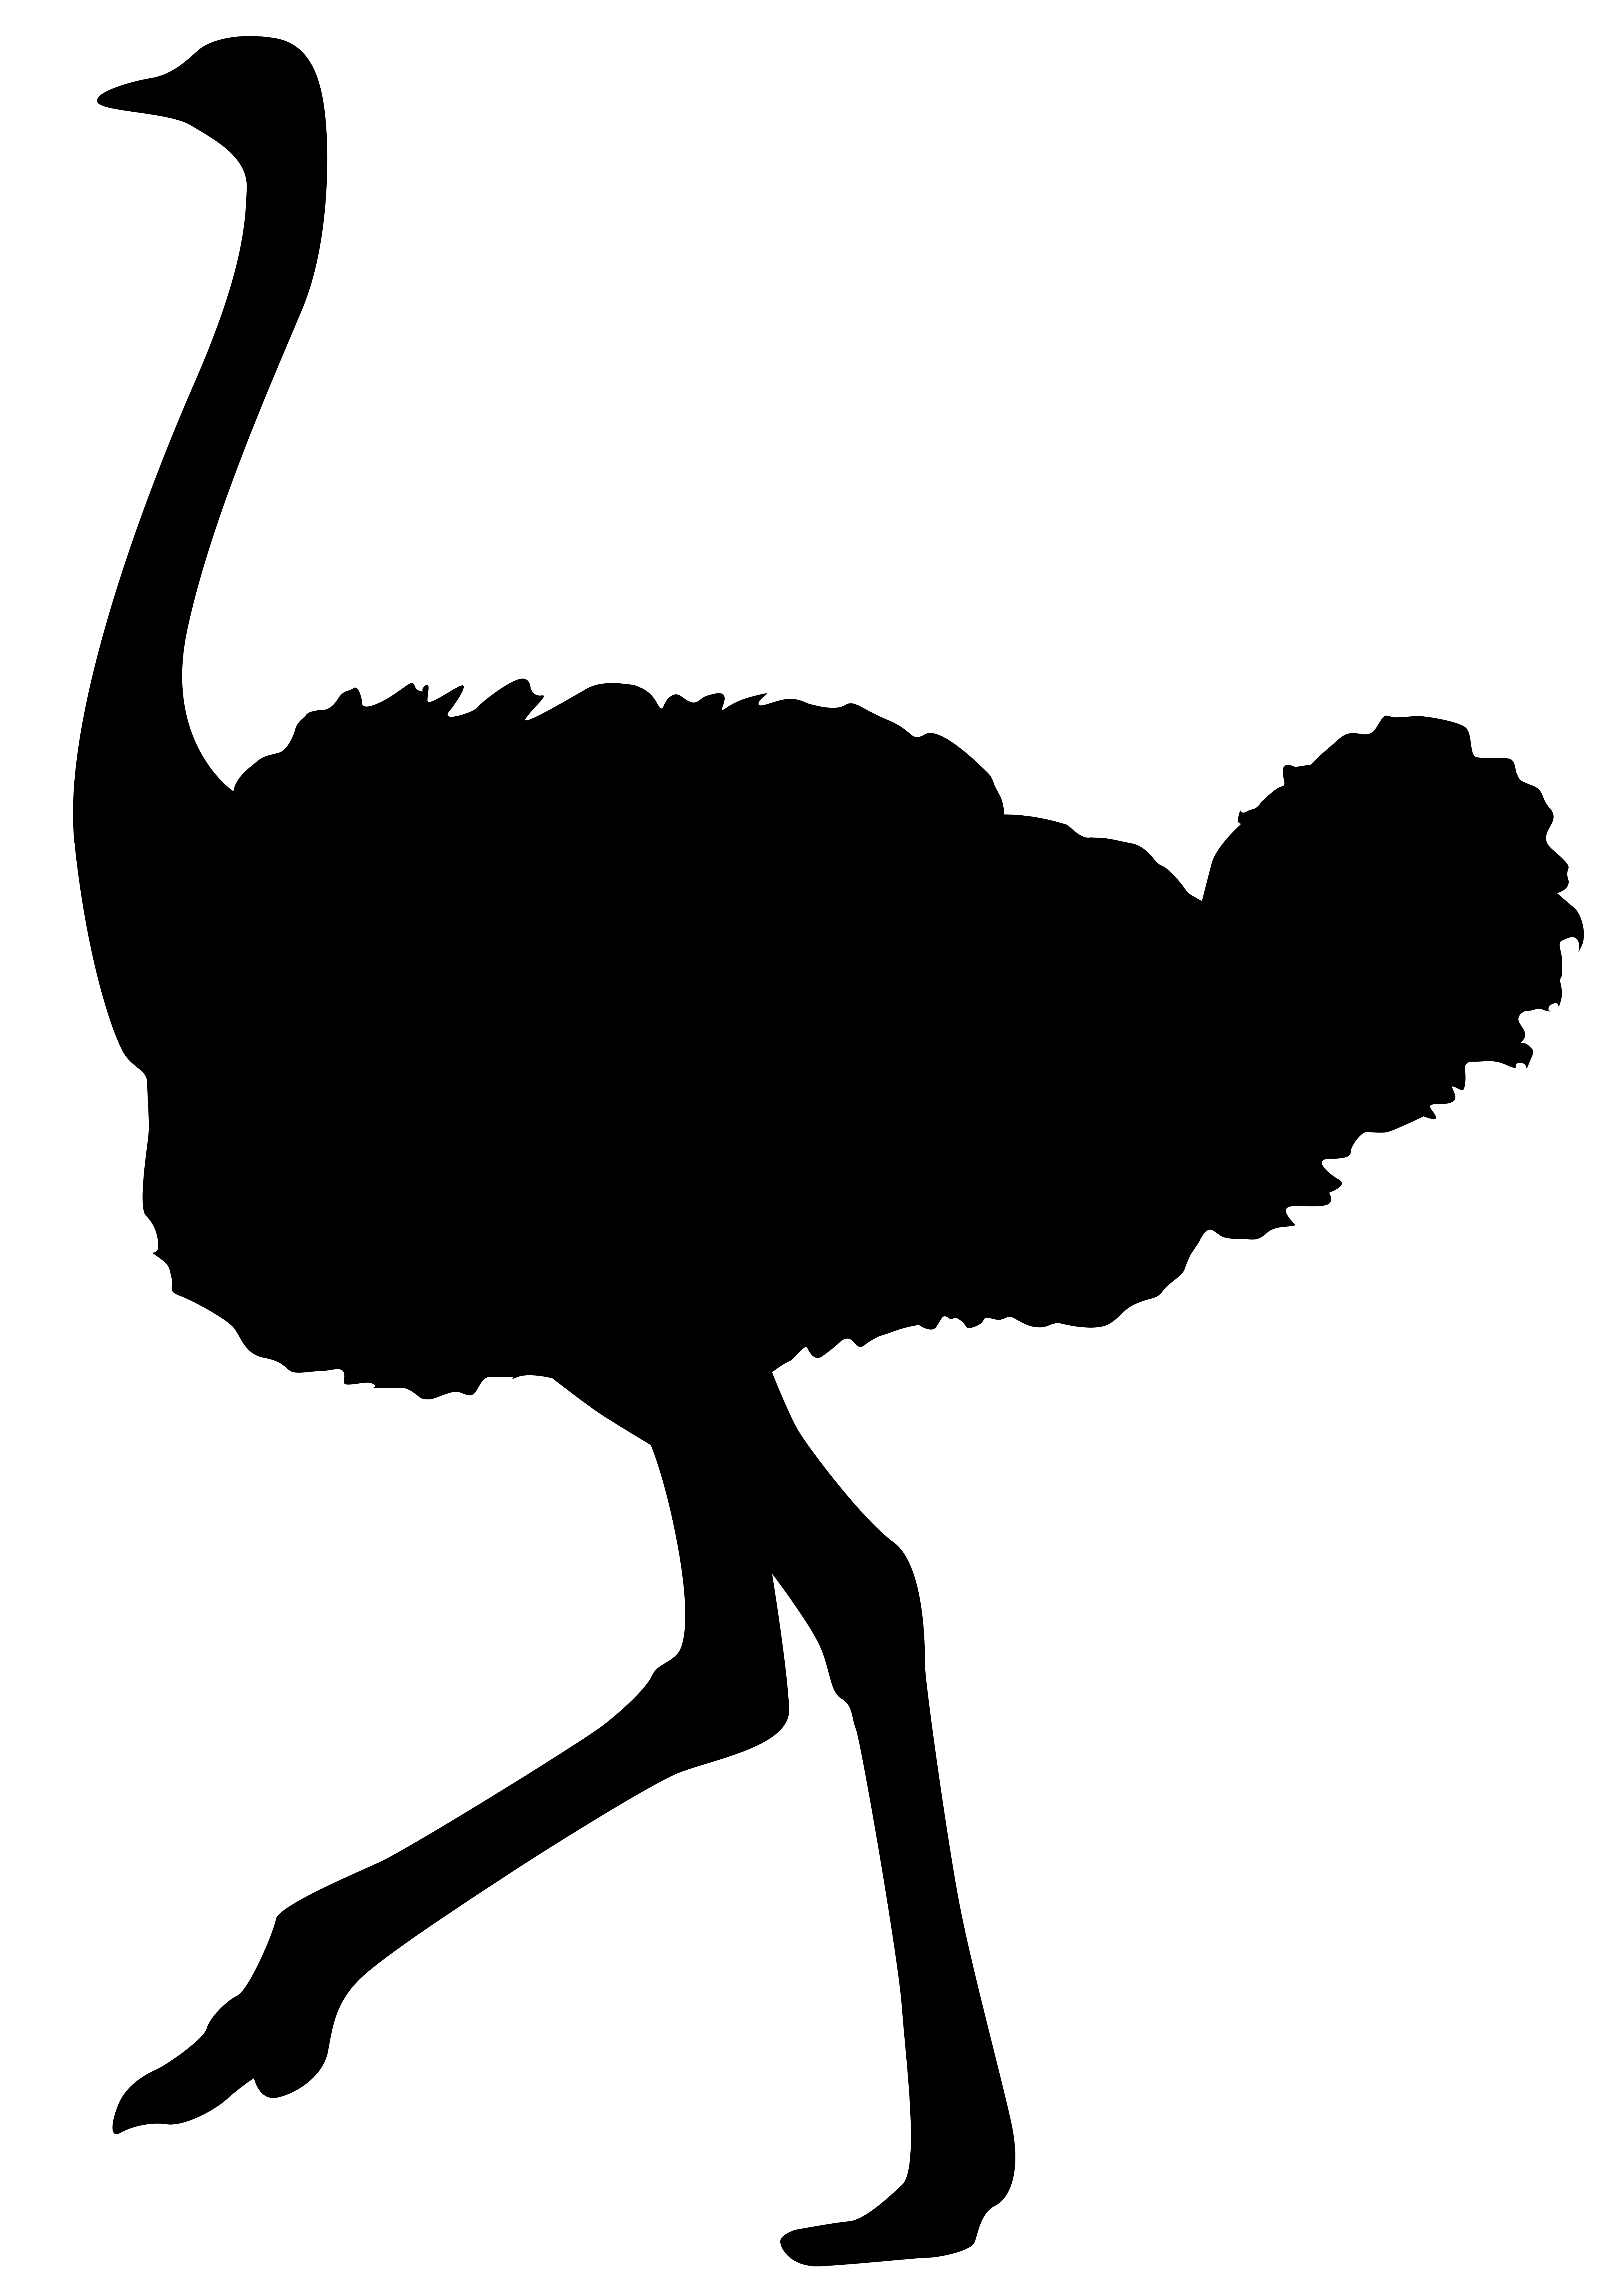 Ostrich Silhouette PNG Transparent Clip Art Image